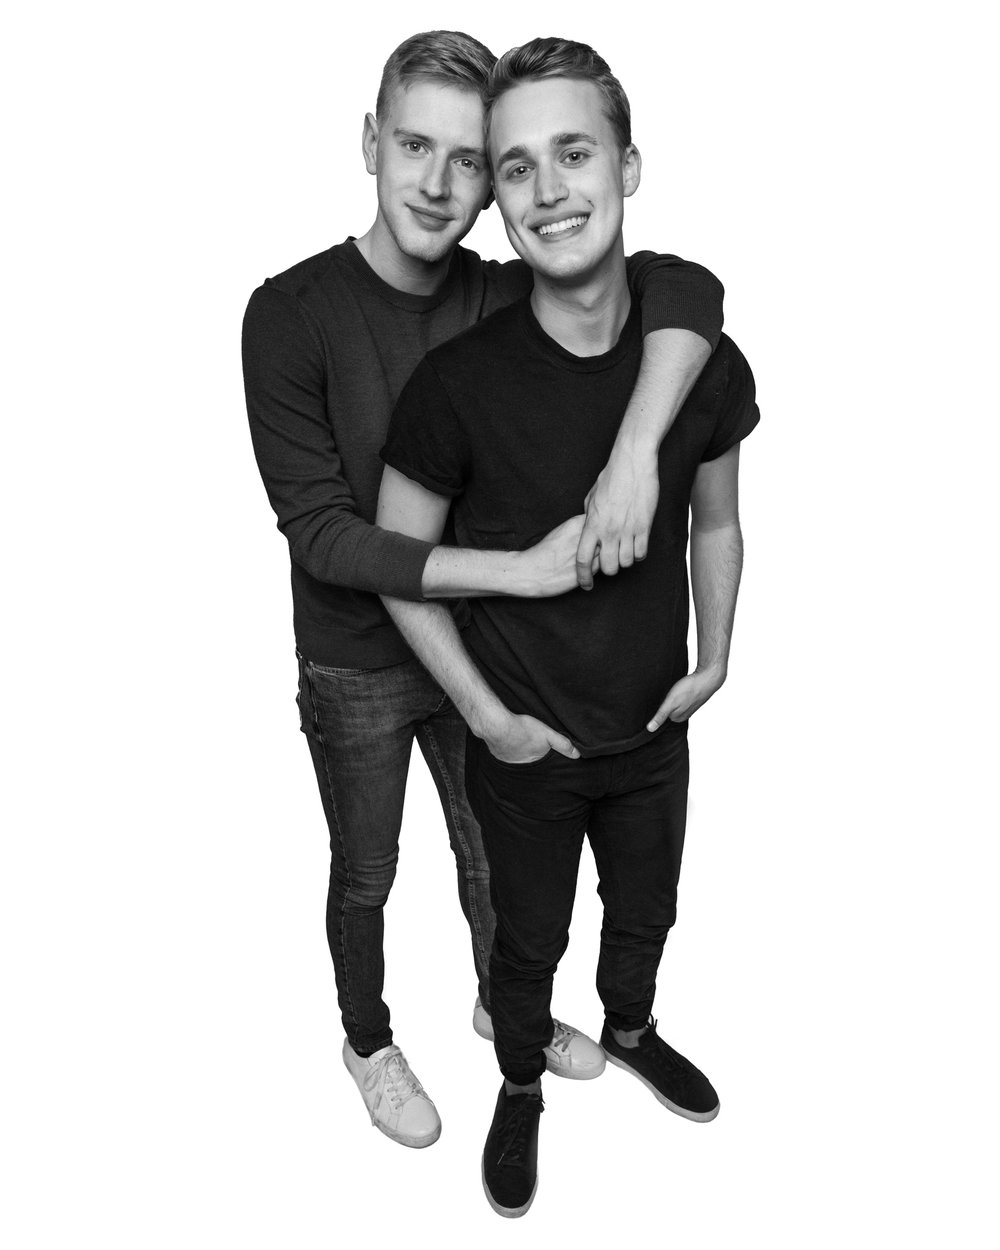 Zach and Cody.jpg